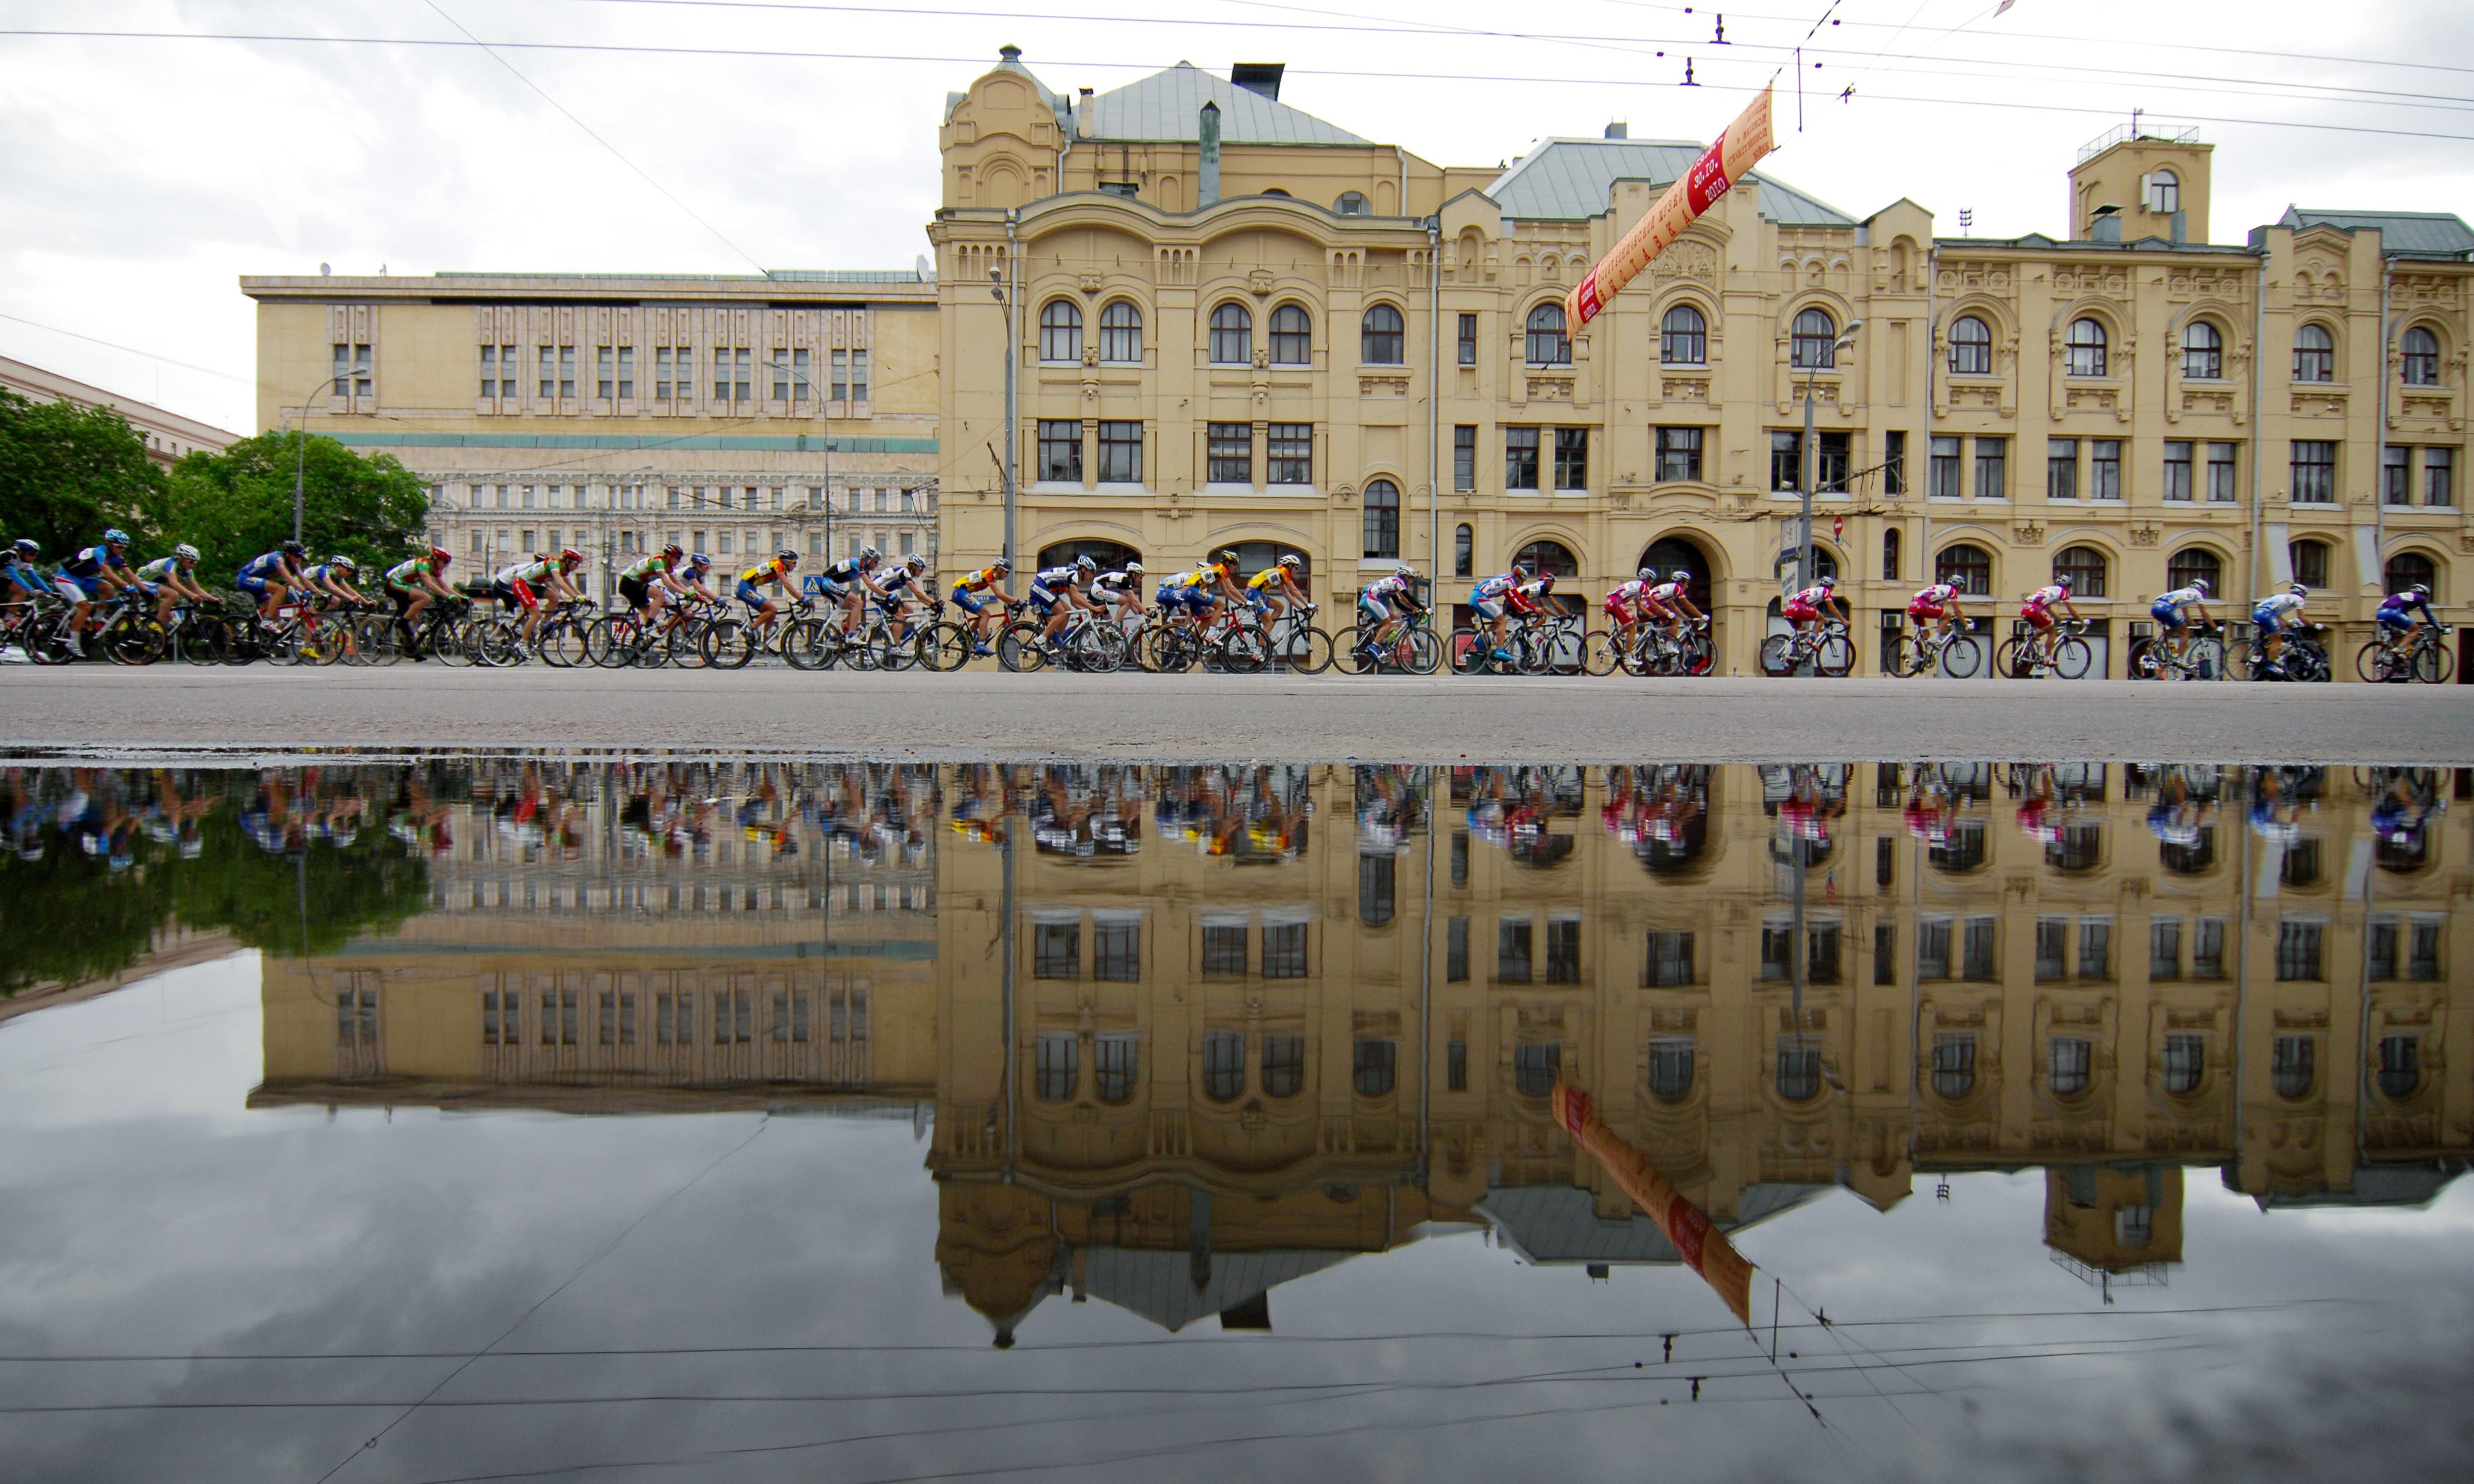 Политехнический музей до реконструкции. Фото ©РИА Новости / Константин Чалабов